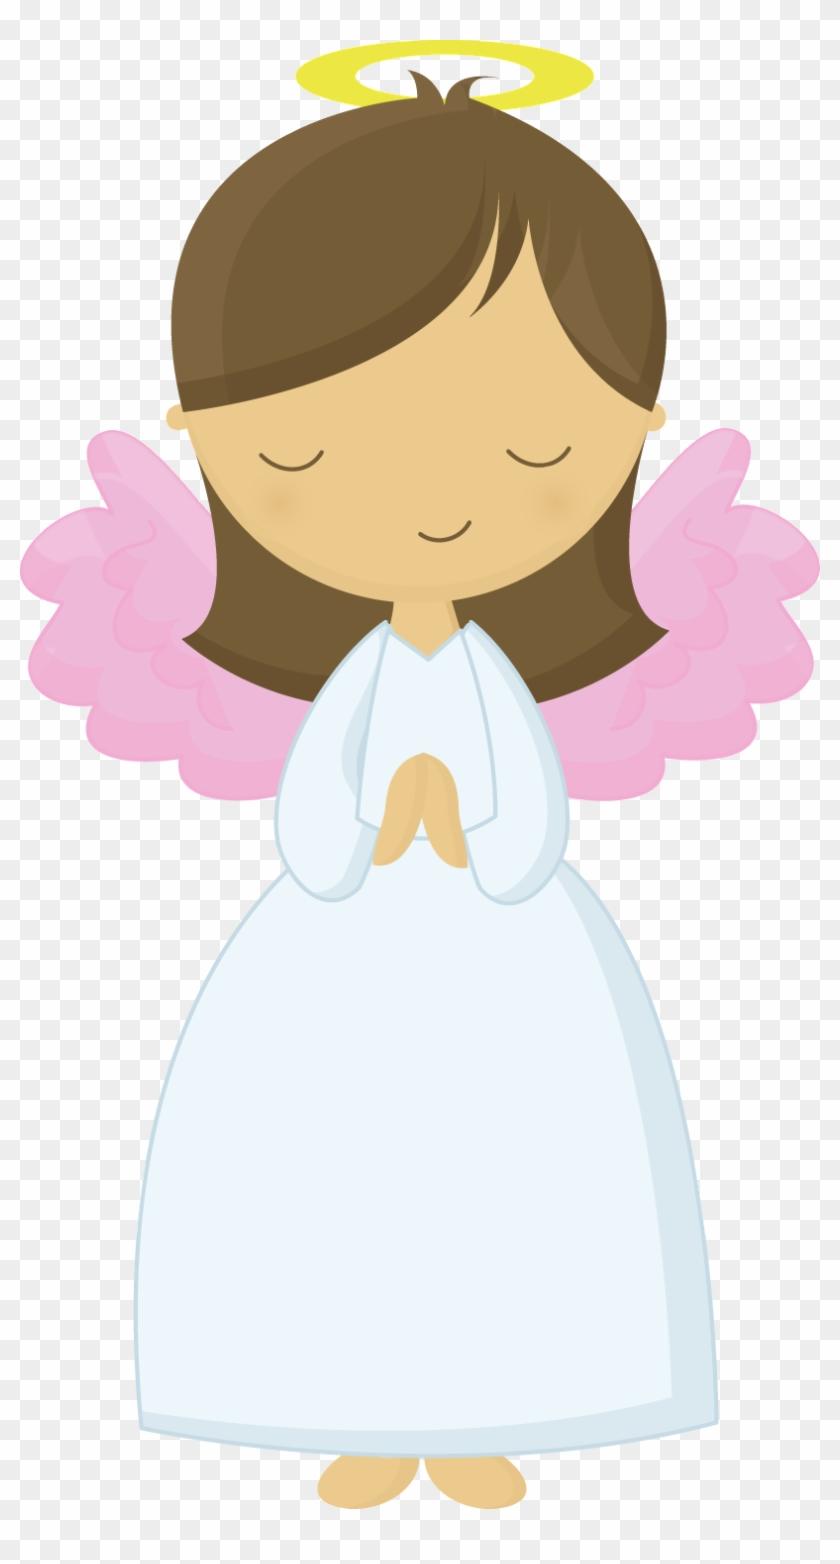 Little Angel Clipart Free Download Clip Art.